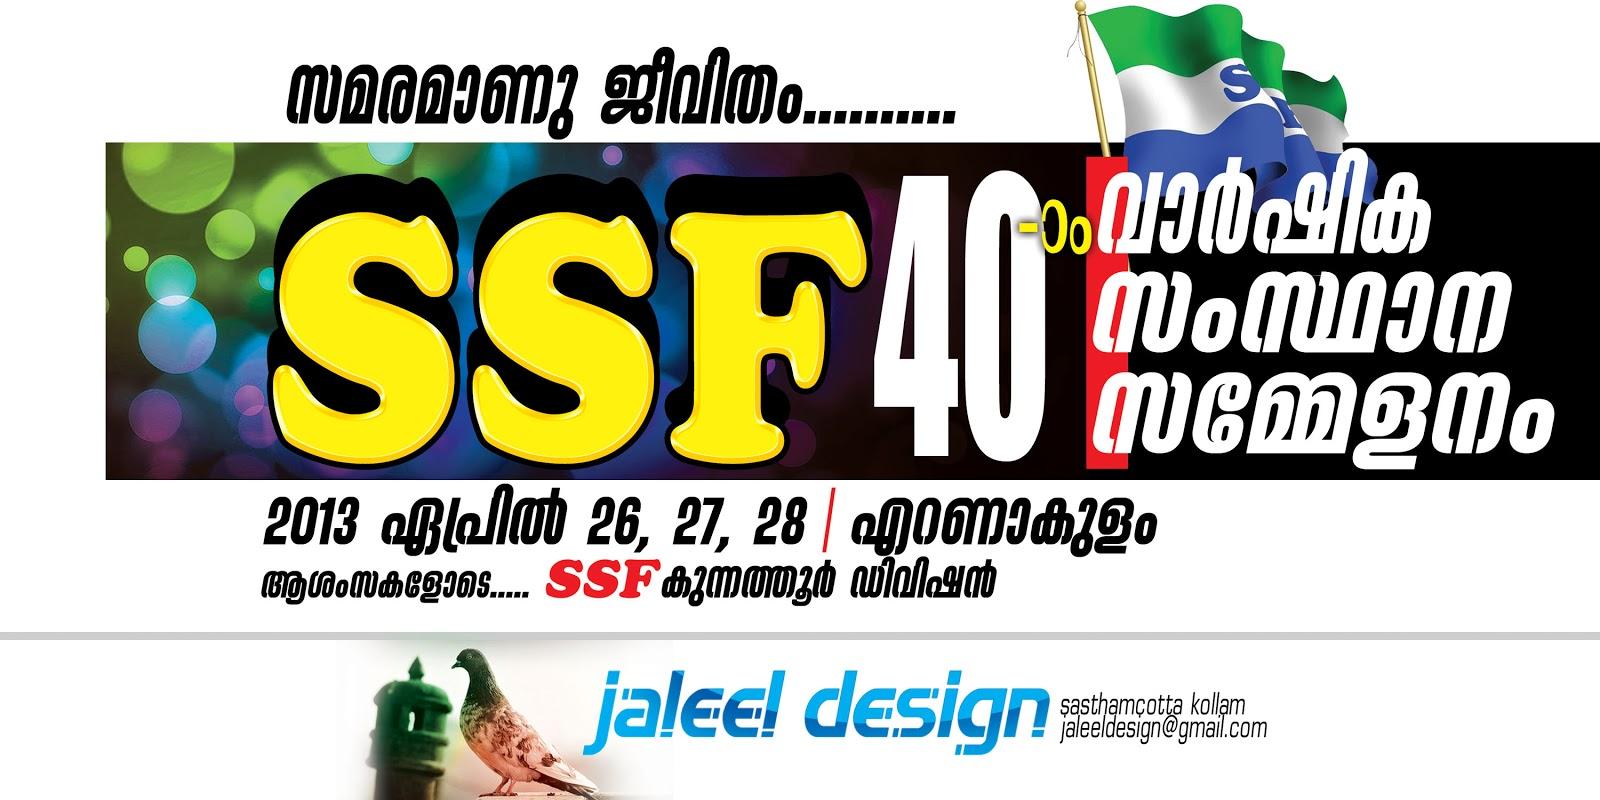 Ssf 40th conference ssf 40th anniversary varshikam new j for Ssf home designs